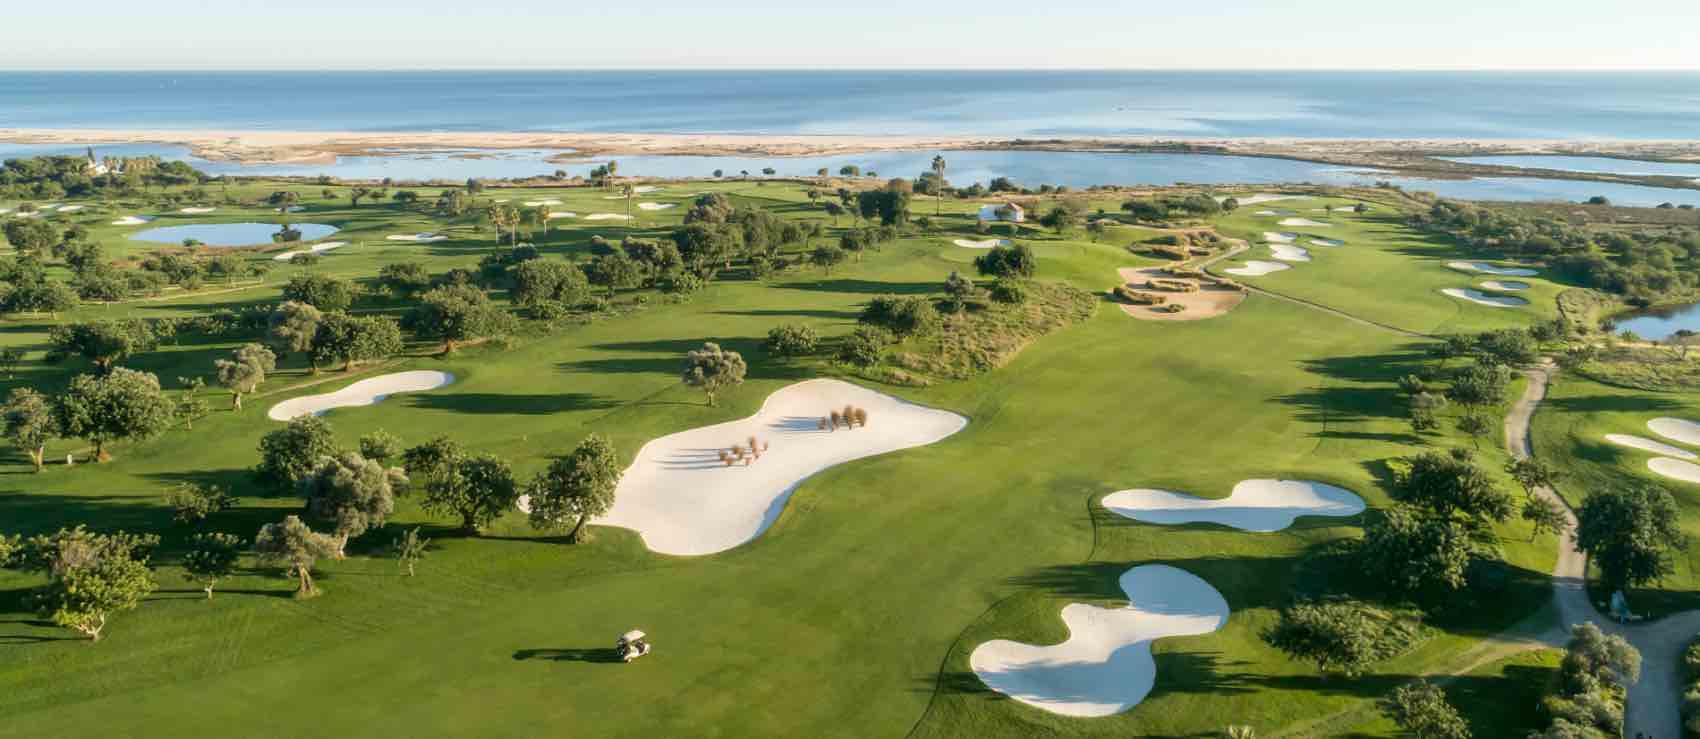 Quinta Ria golf course located next the sea